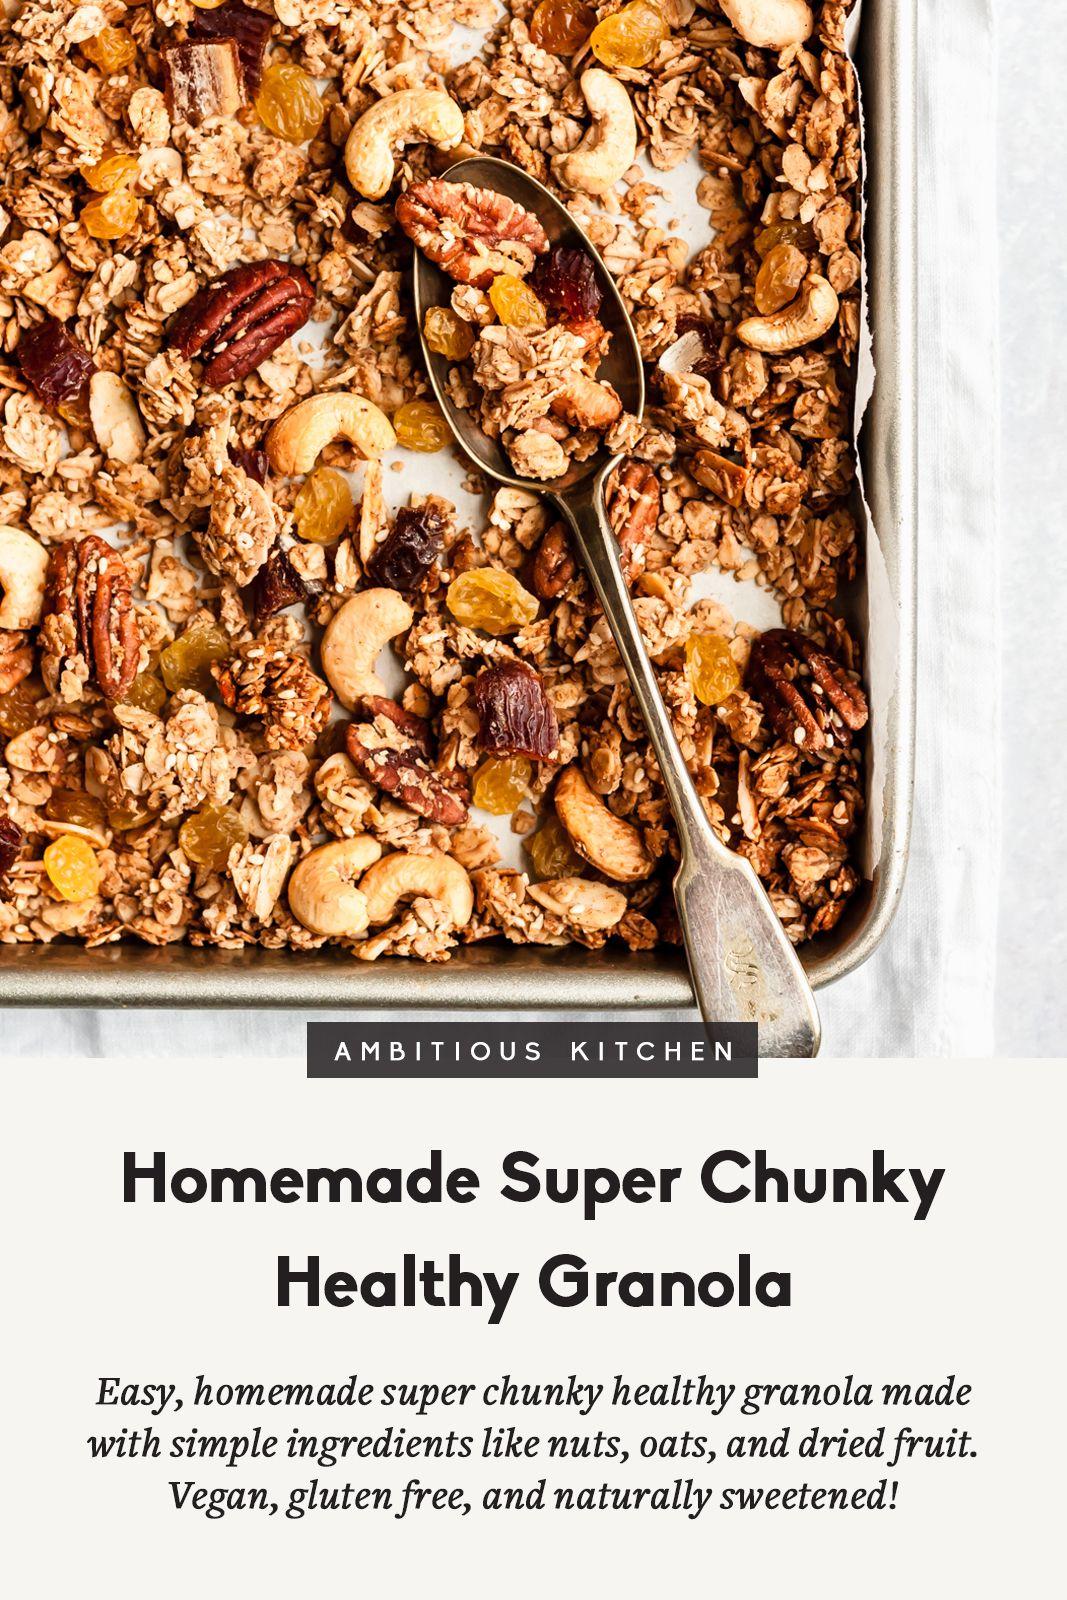 Homemade Super Chunky Healthy Granola Vegan Gluten Free